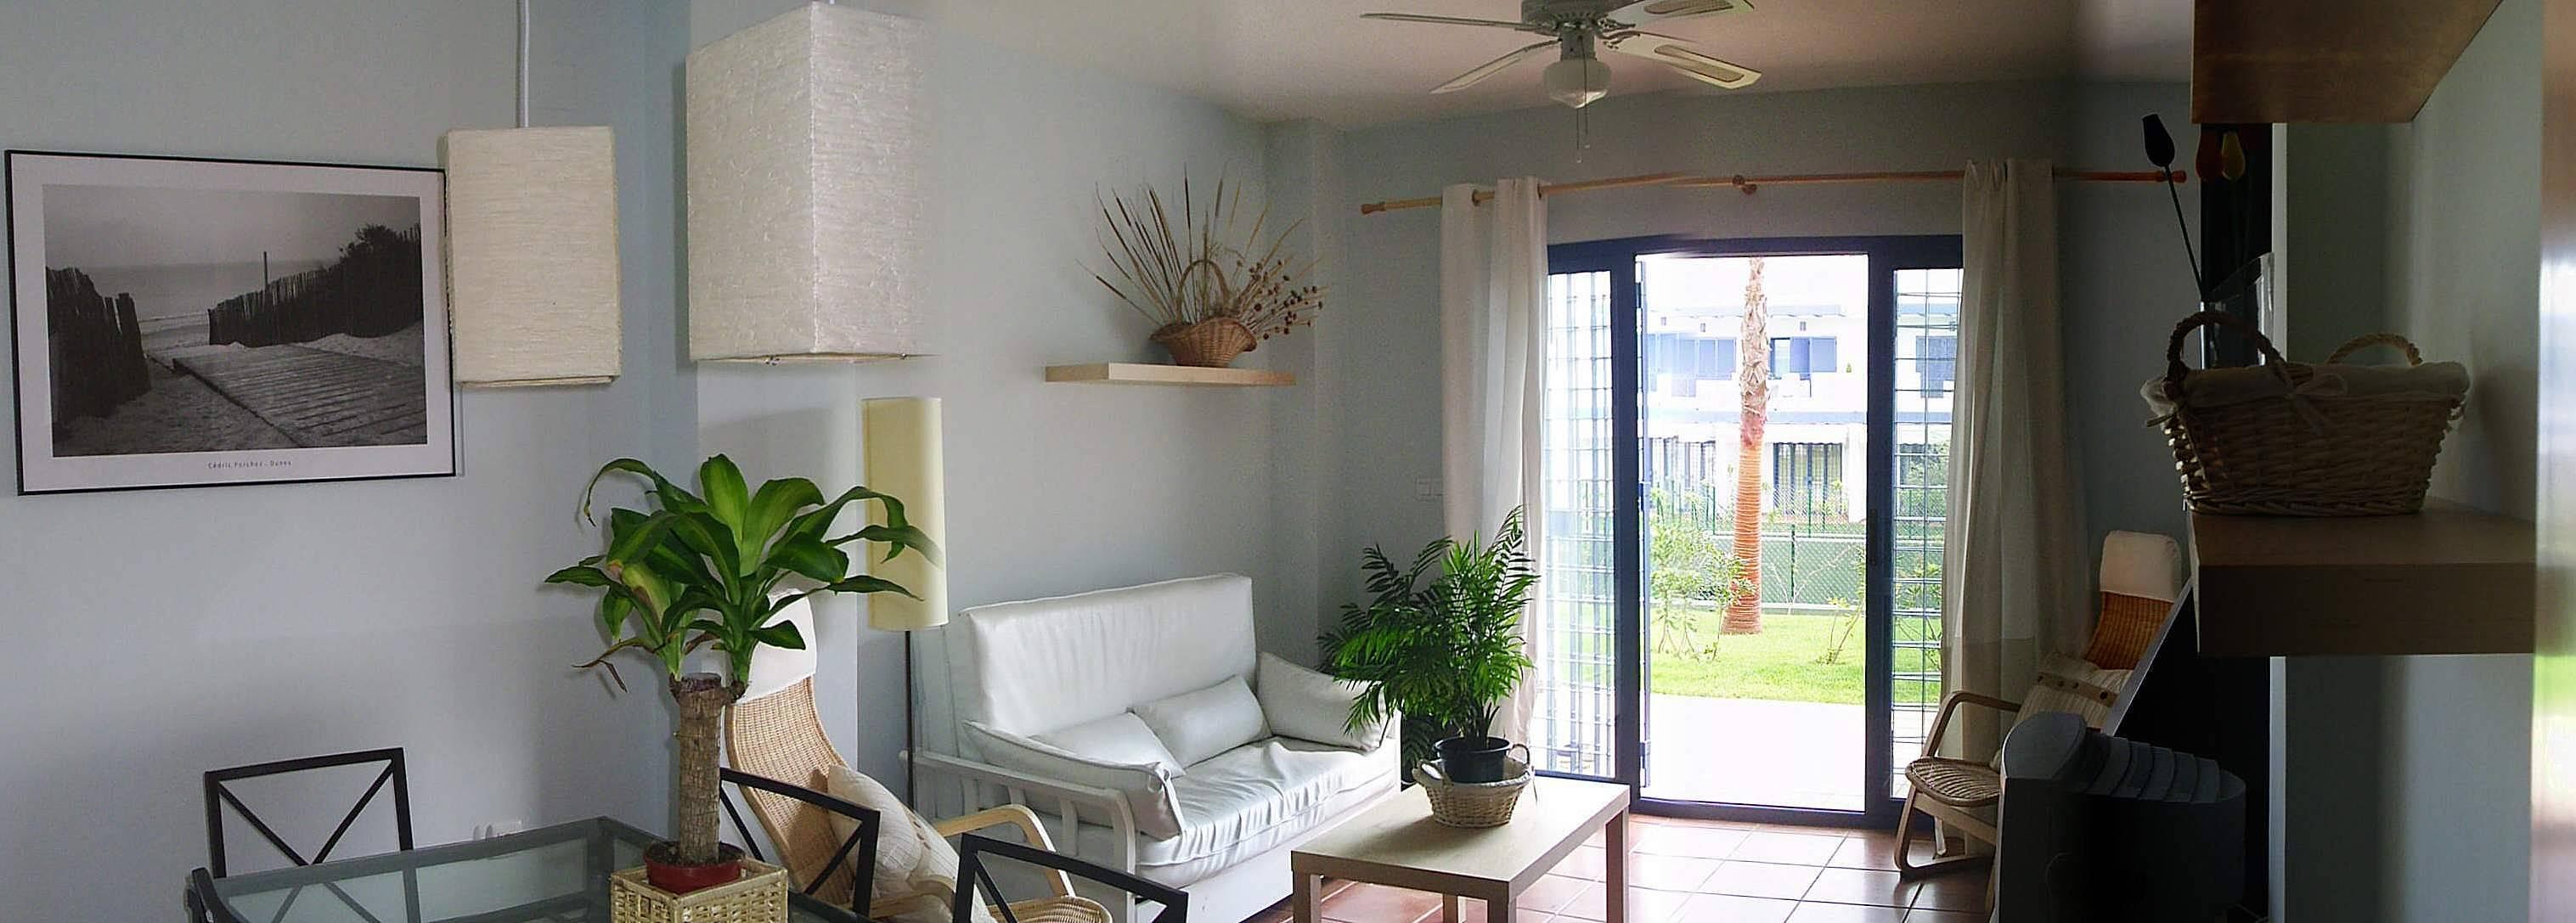 Casa para 4 6 pessoas a 900 m da praia islantilla lepe - Rentalia islantilla ...